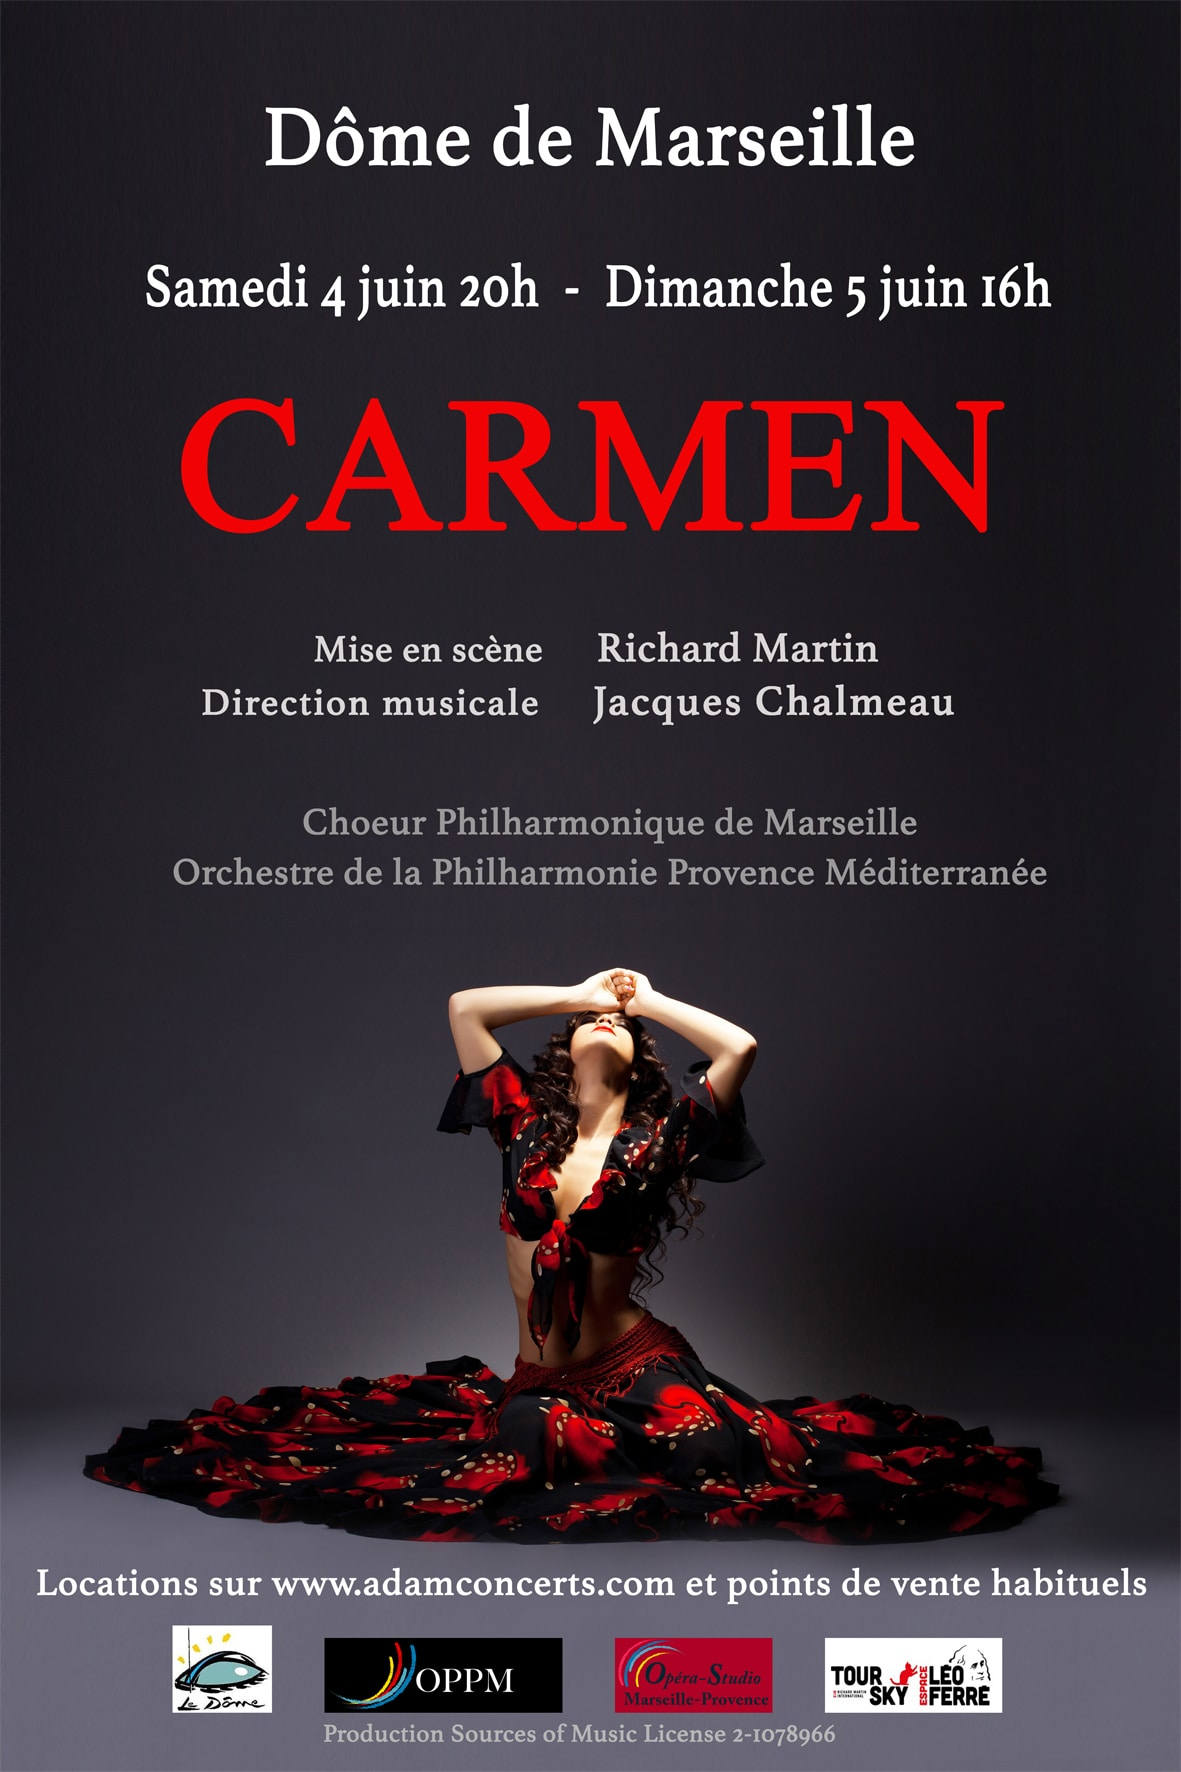 carmen_marseille-2.jpg